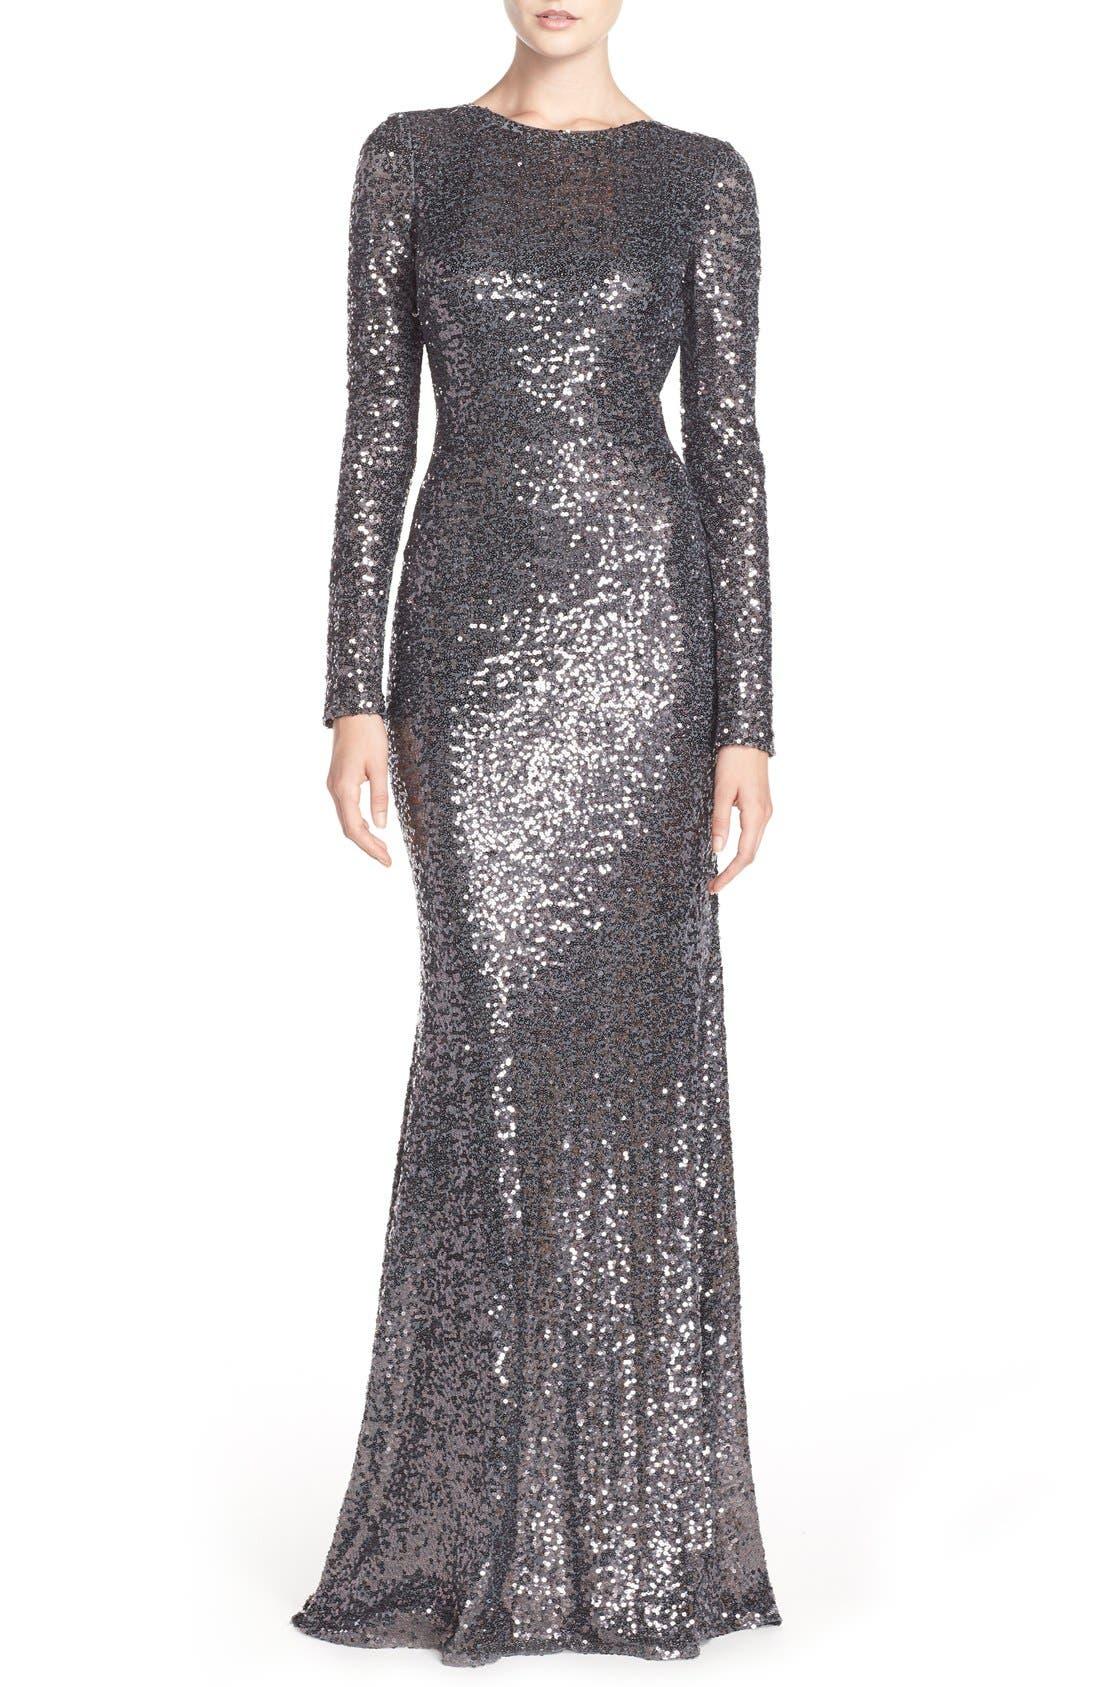 Main Image - Badgley Mischka Cowl Back Sequin Gown